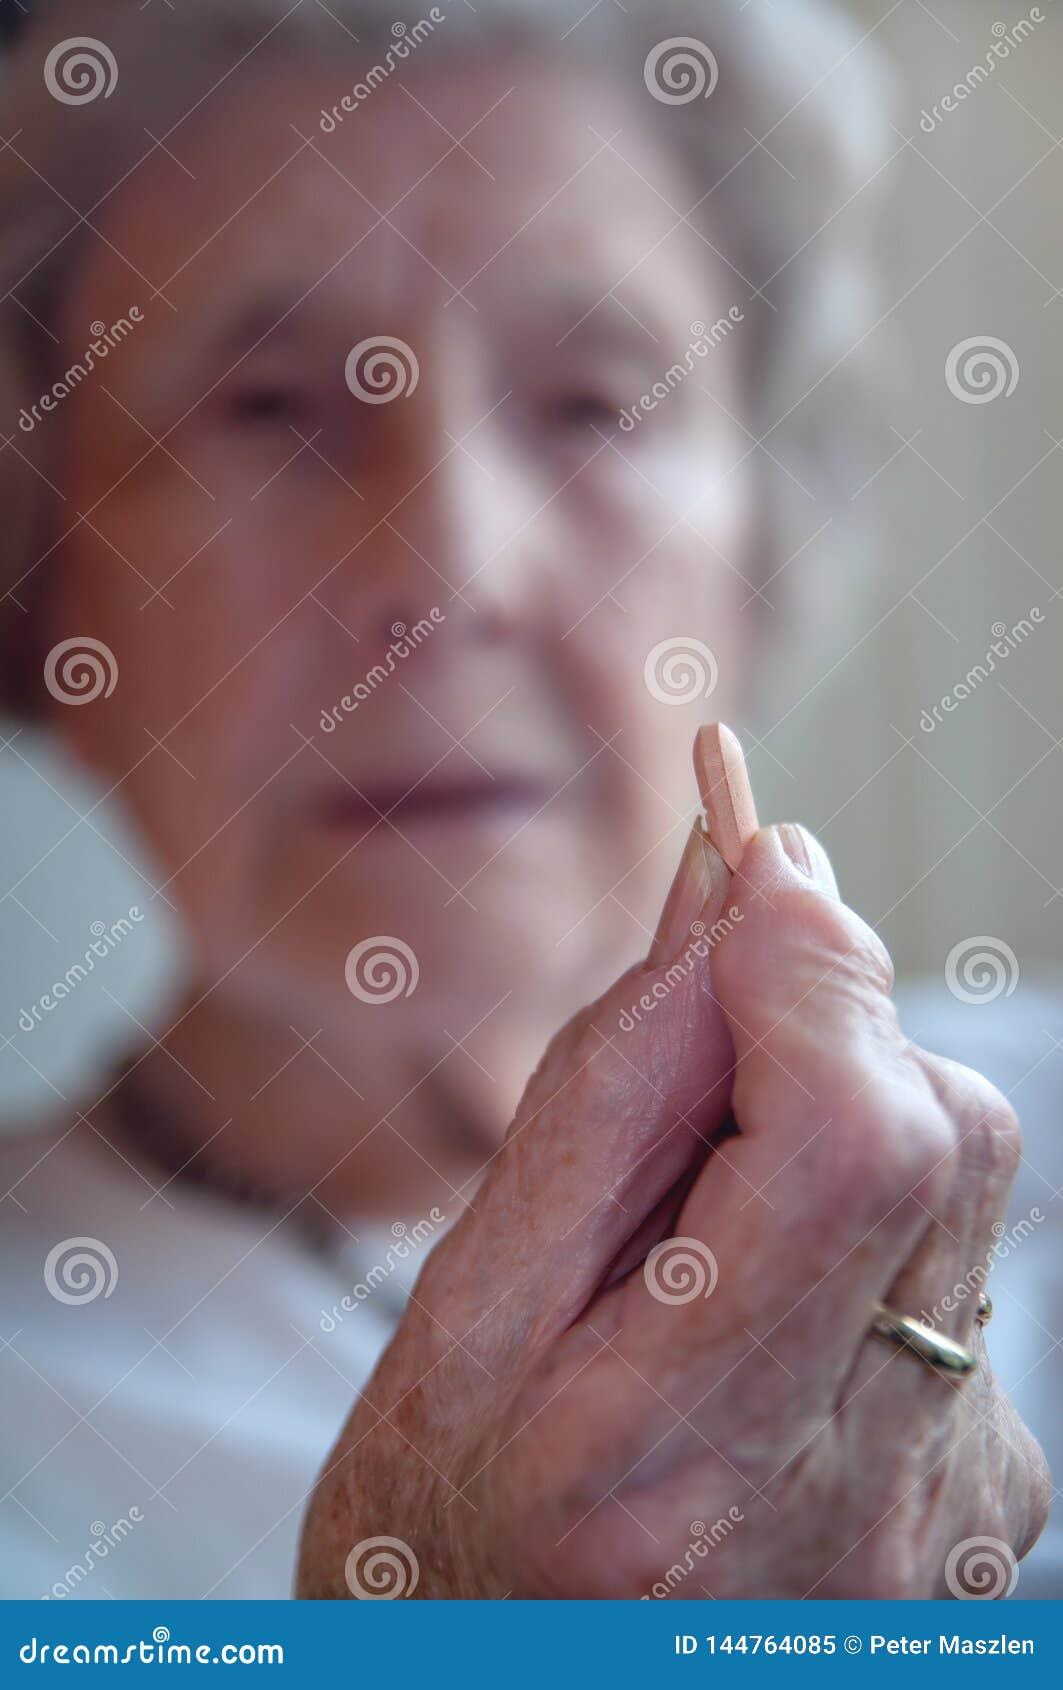 Sad senior woman taking pill